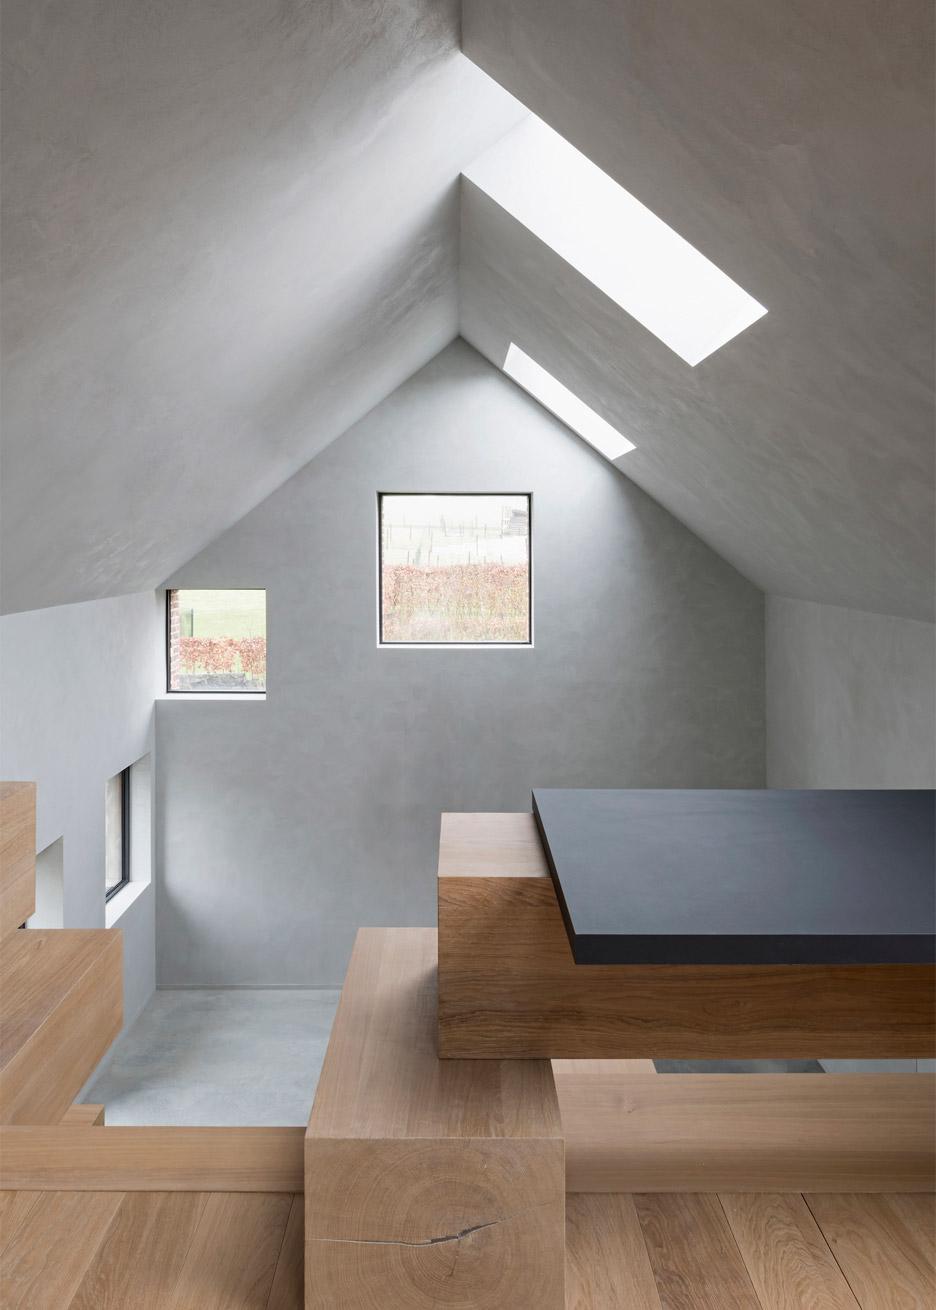 architecture_wood_office_design_studia_interiors_osnovadesign_osnova_poltava_11